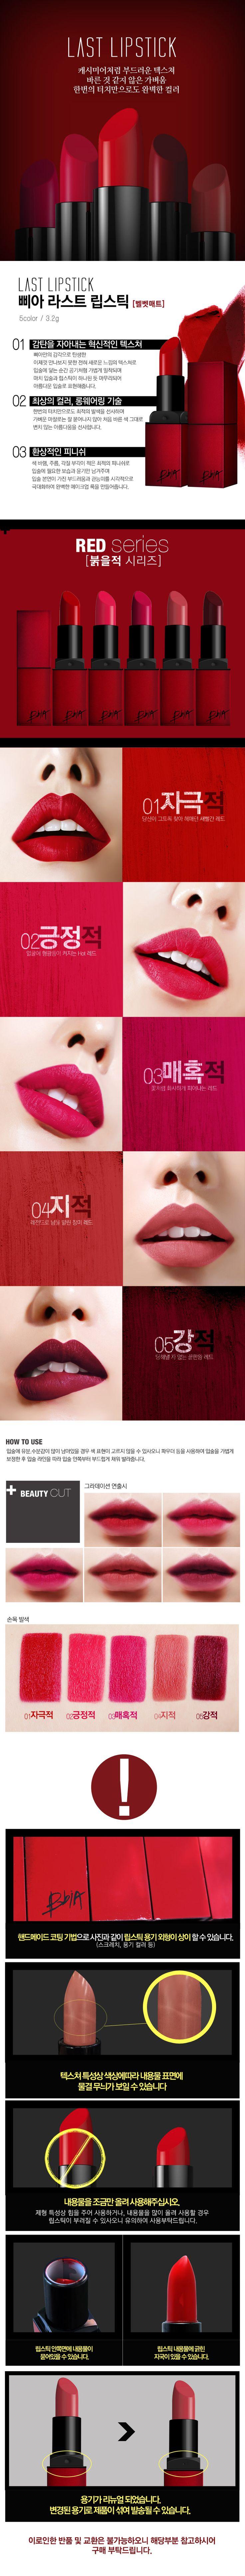 bbia [라스트 립스틱]                         제품명     삐아 라스트 립스틱             용량 또는 중량     3.2g      피부타입     모든 피부 타입             호수 및 색상     상세페이지 참조       사용방법     입술에 유분.수분감이 많이 남아있을 경우 색 표현이 고르지 않을 수 있사오니 파우더 등을 사용하여 입술을 가볍게 보정한 후 입술 라인을 따라 입술 안쪽부터 부드럽게 채워 발라줍니다.             제조일자 및 사용기한     [01자극적] 2016.03~ 2018.03 / [02긍정적] 2016.01~ 2018.01 / [03매혹적] 2016.01  ~ 2018.01 / [04지적] 2016.03 ~ 2018.03 / [05강적] 2016.02 ~ 2018.02 개봉후 12개월이내 사용권장          제조판매업자     (주)스카이007             제조국     대한민국…